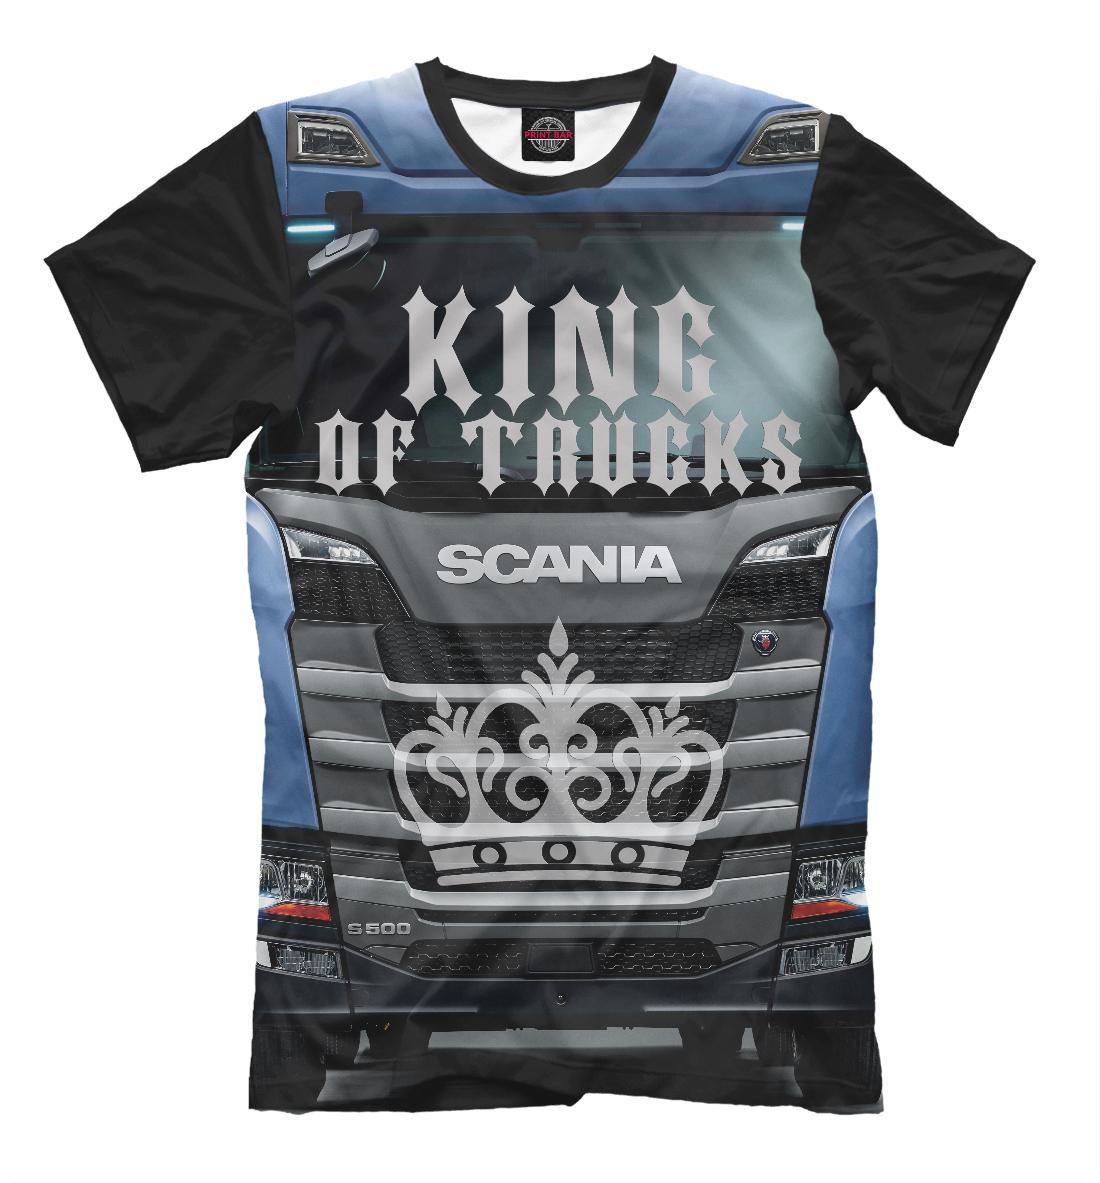 SCANIA - король грузовиков, Printbar, Футболки, GRZ-768093-fut-2  - купить со скидкой